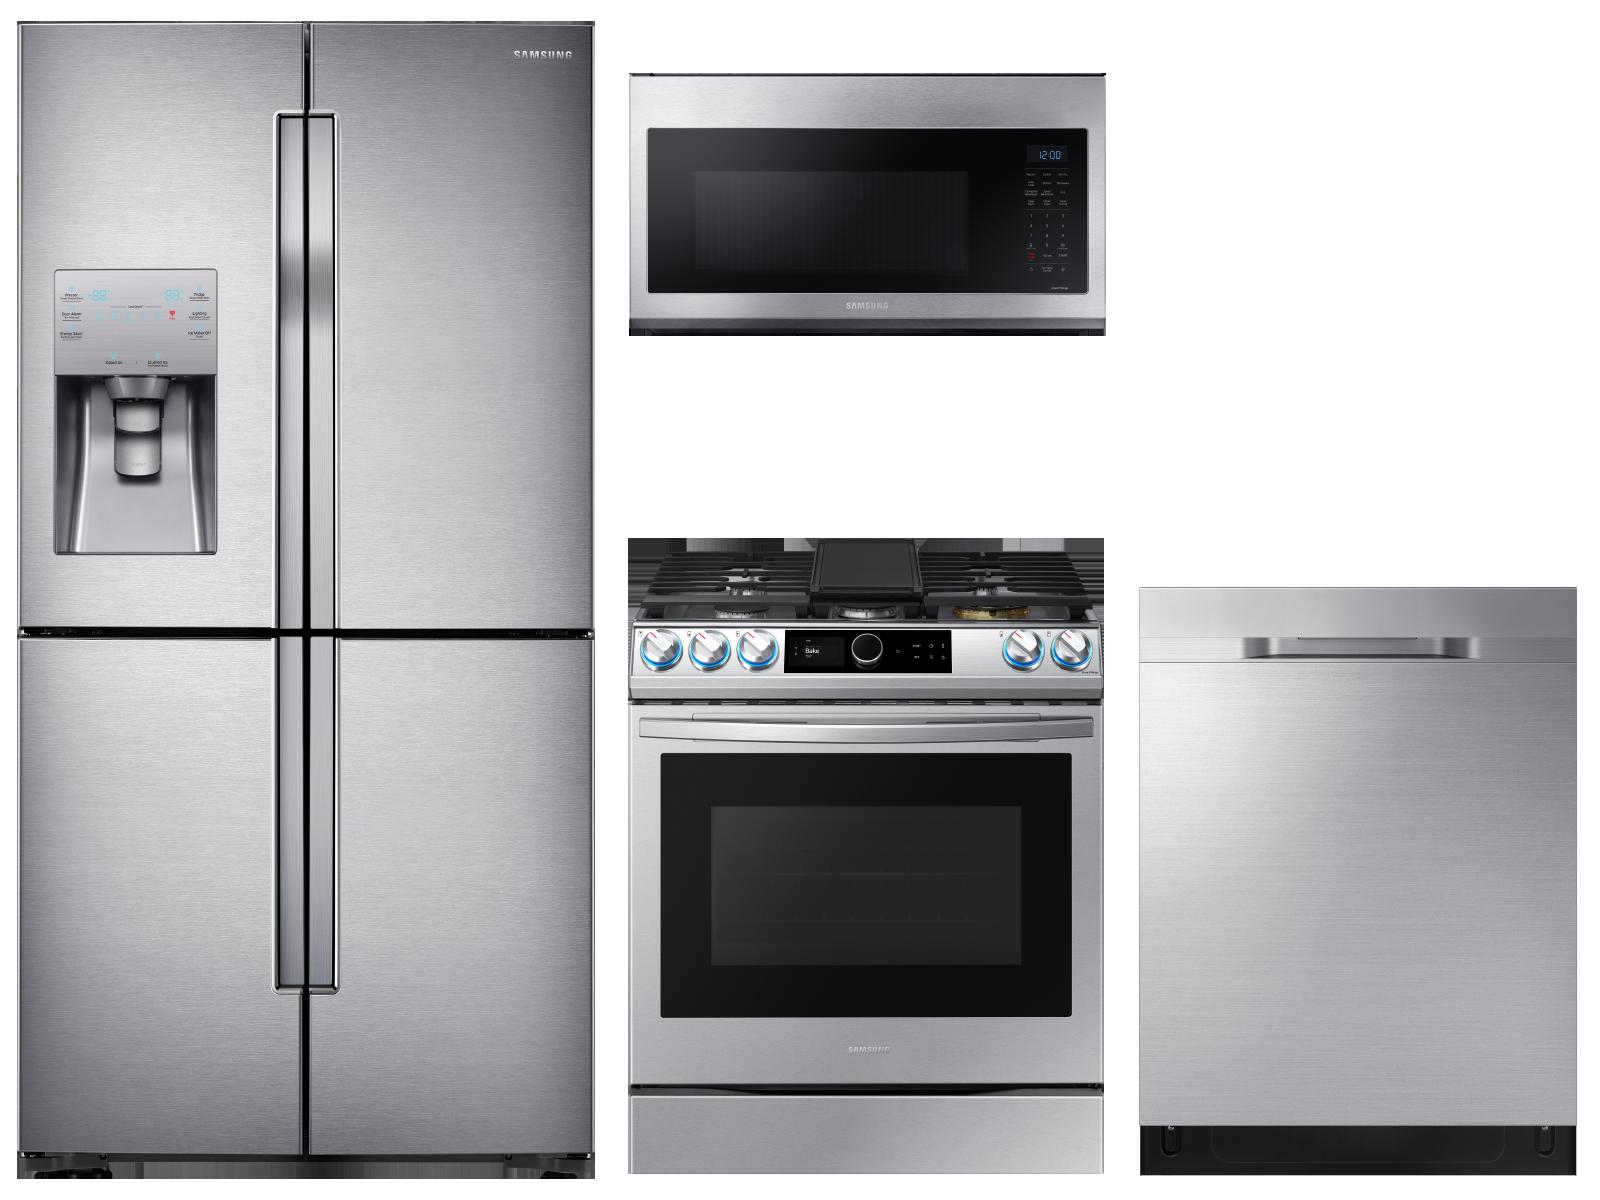 4-Door Flex™ Refrigerator + Slide-in Gas Range with Smart Dial & Air Fry + Dishwasher + Microwave in Stainless Steel